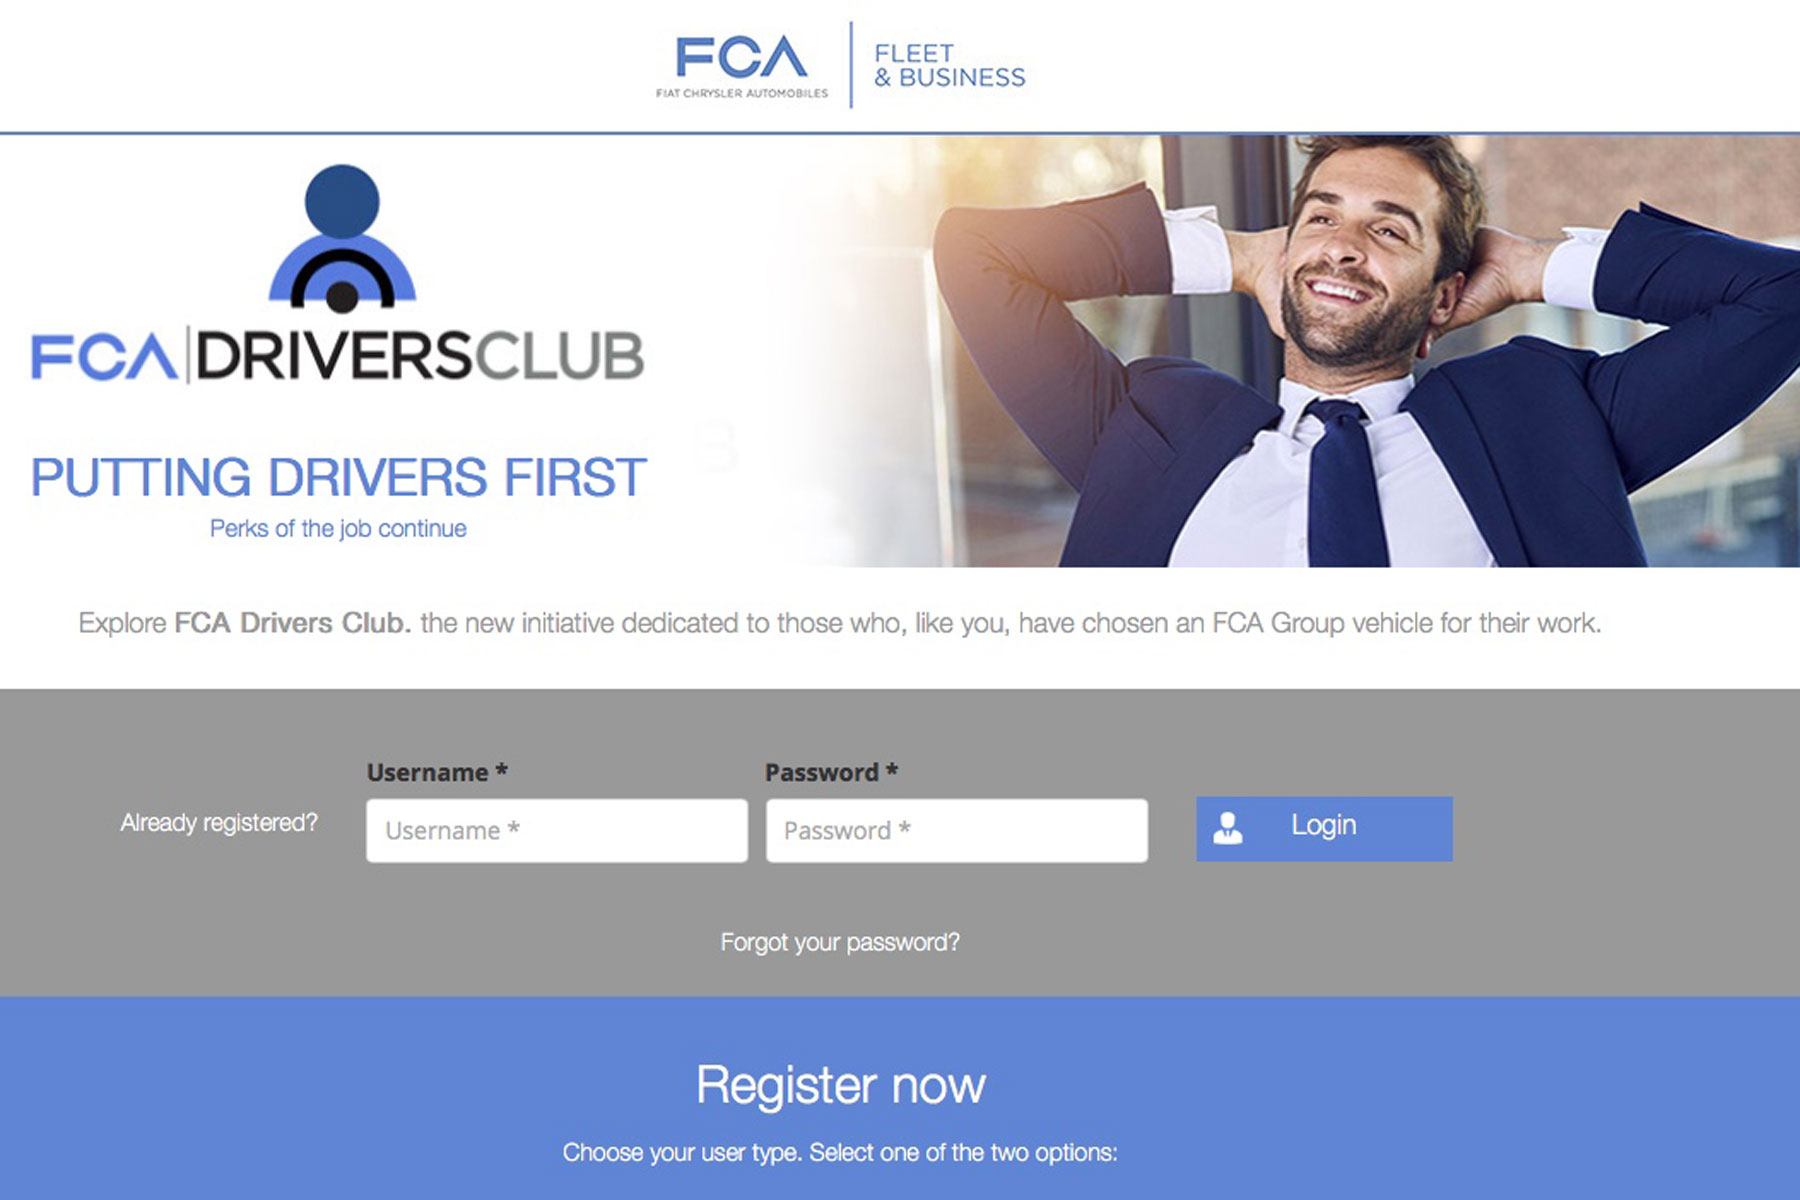 FCA Drivers Club website